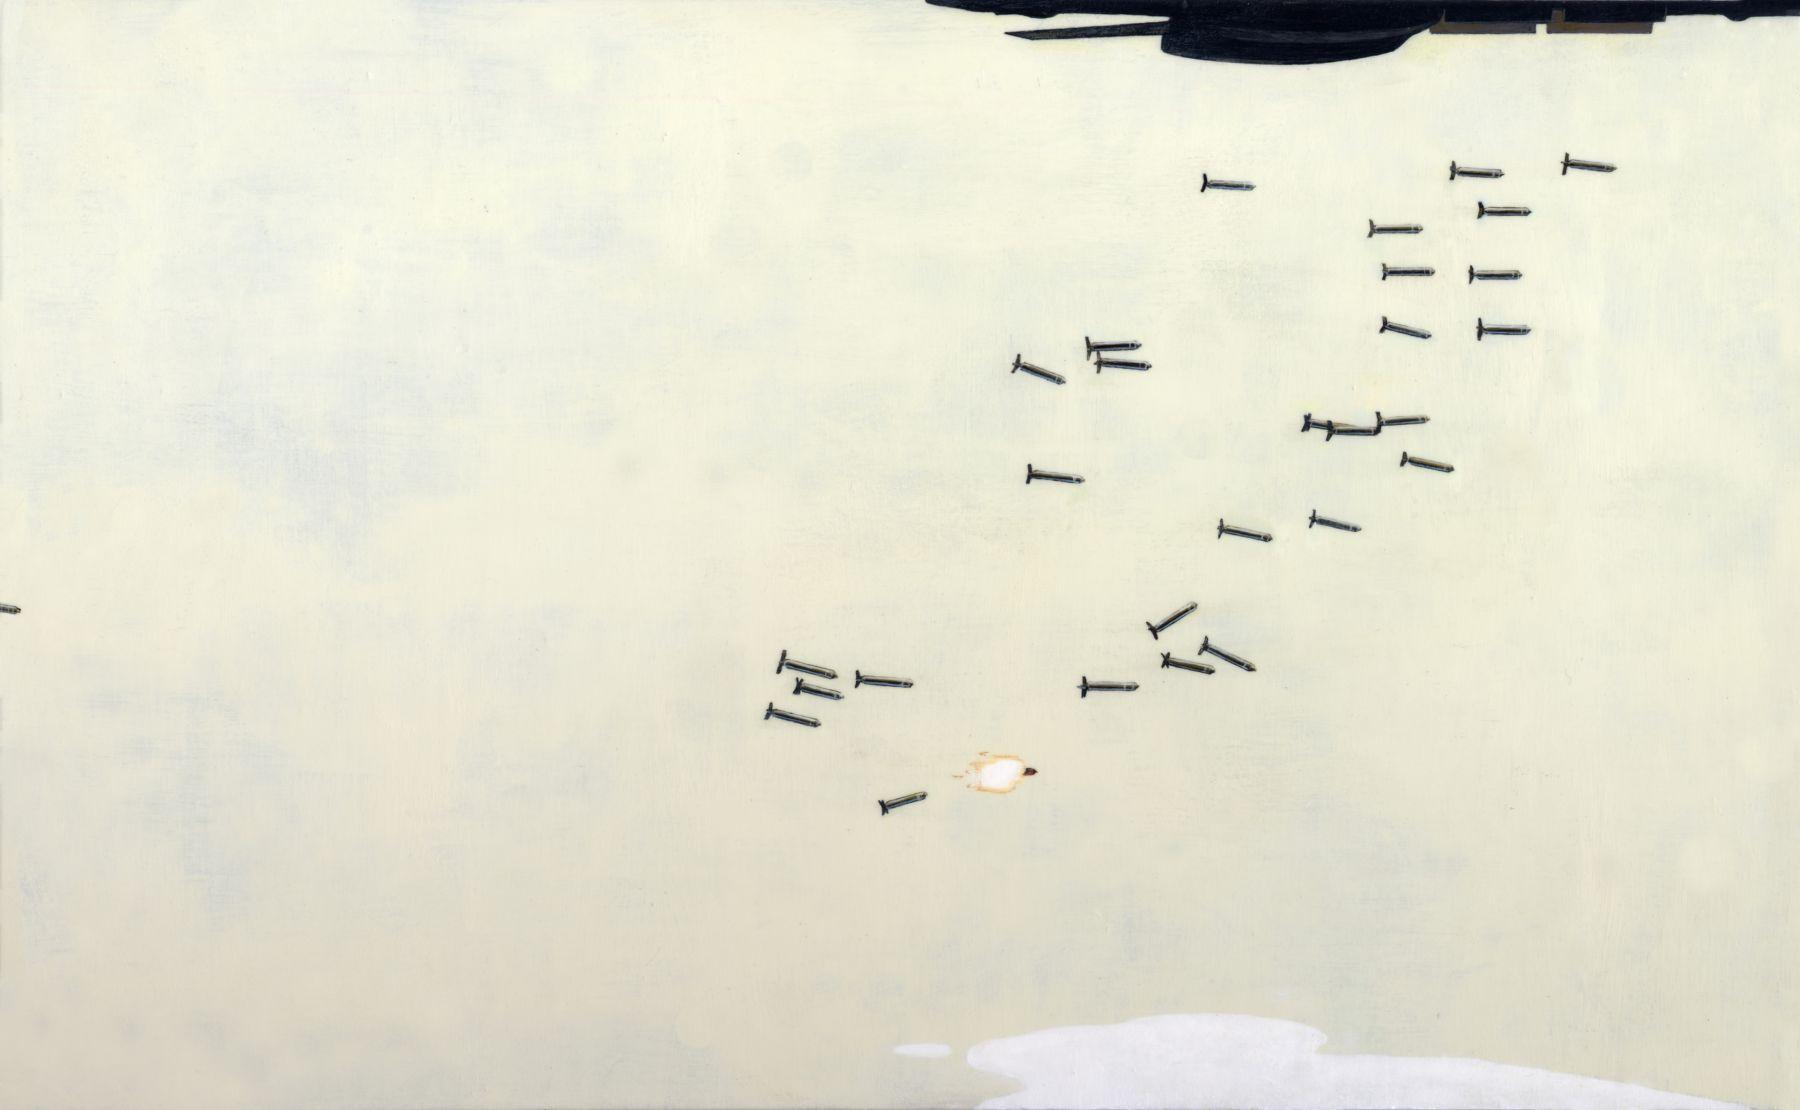 ADAM MYSOCK The Bombs Bursting in Air, 2009